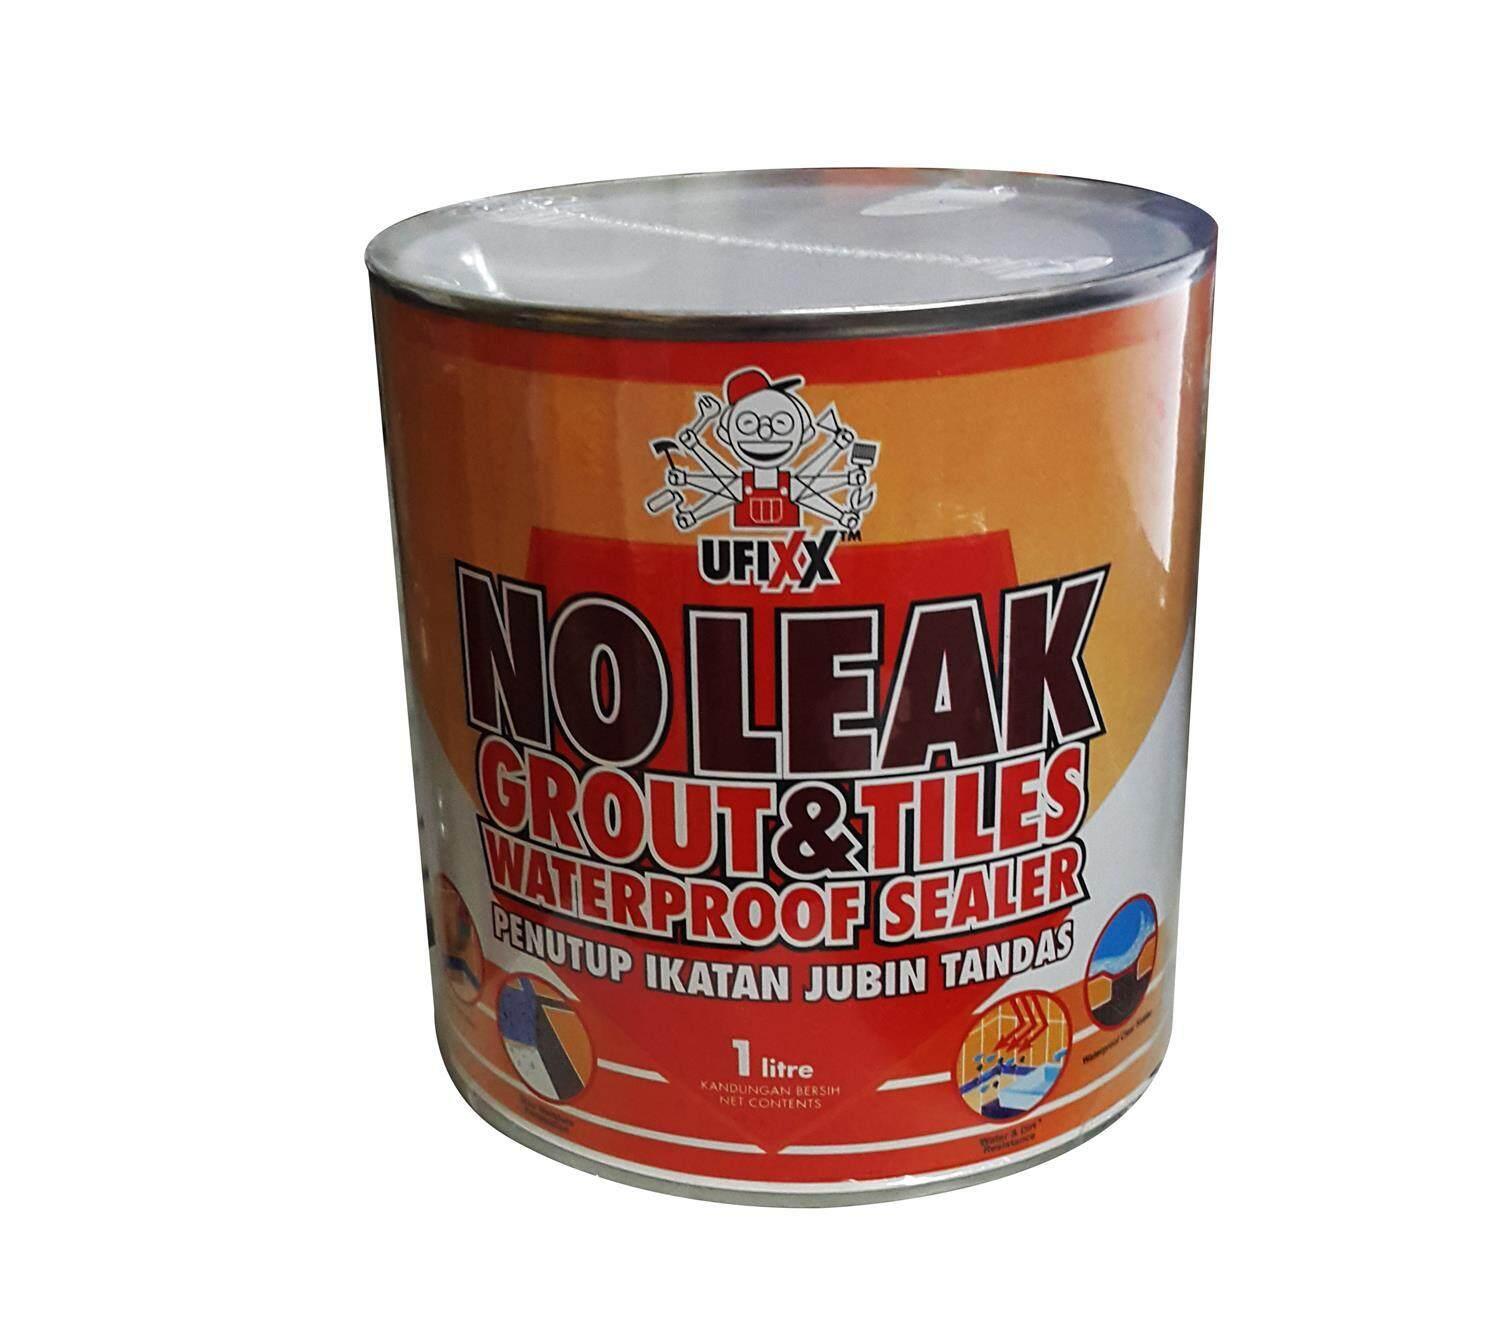 1 Lit UFIXX No leak Grout & Tile Waterproof Sealer , Waterproof Sealer No leak Grout & Tile